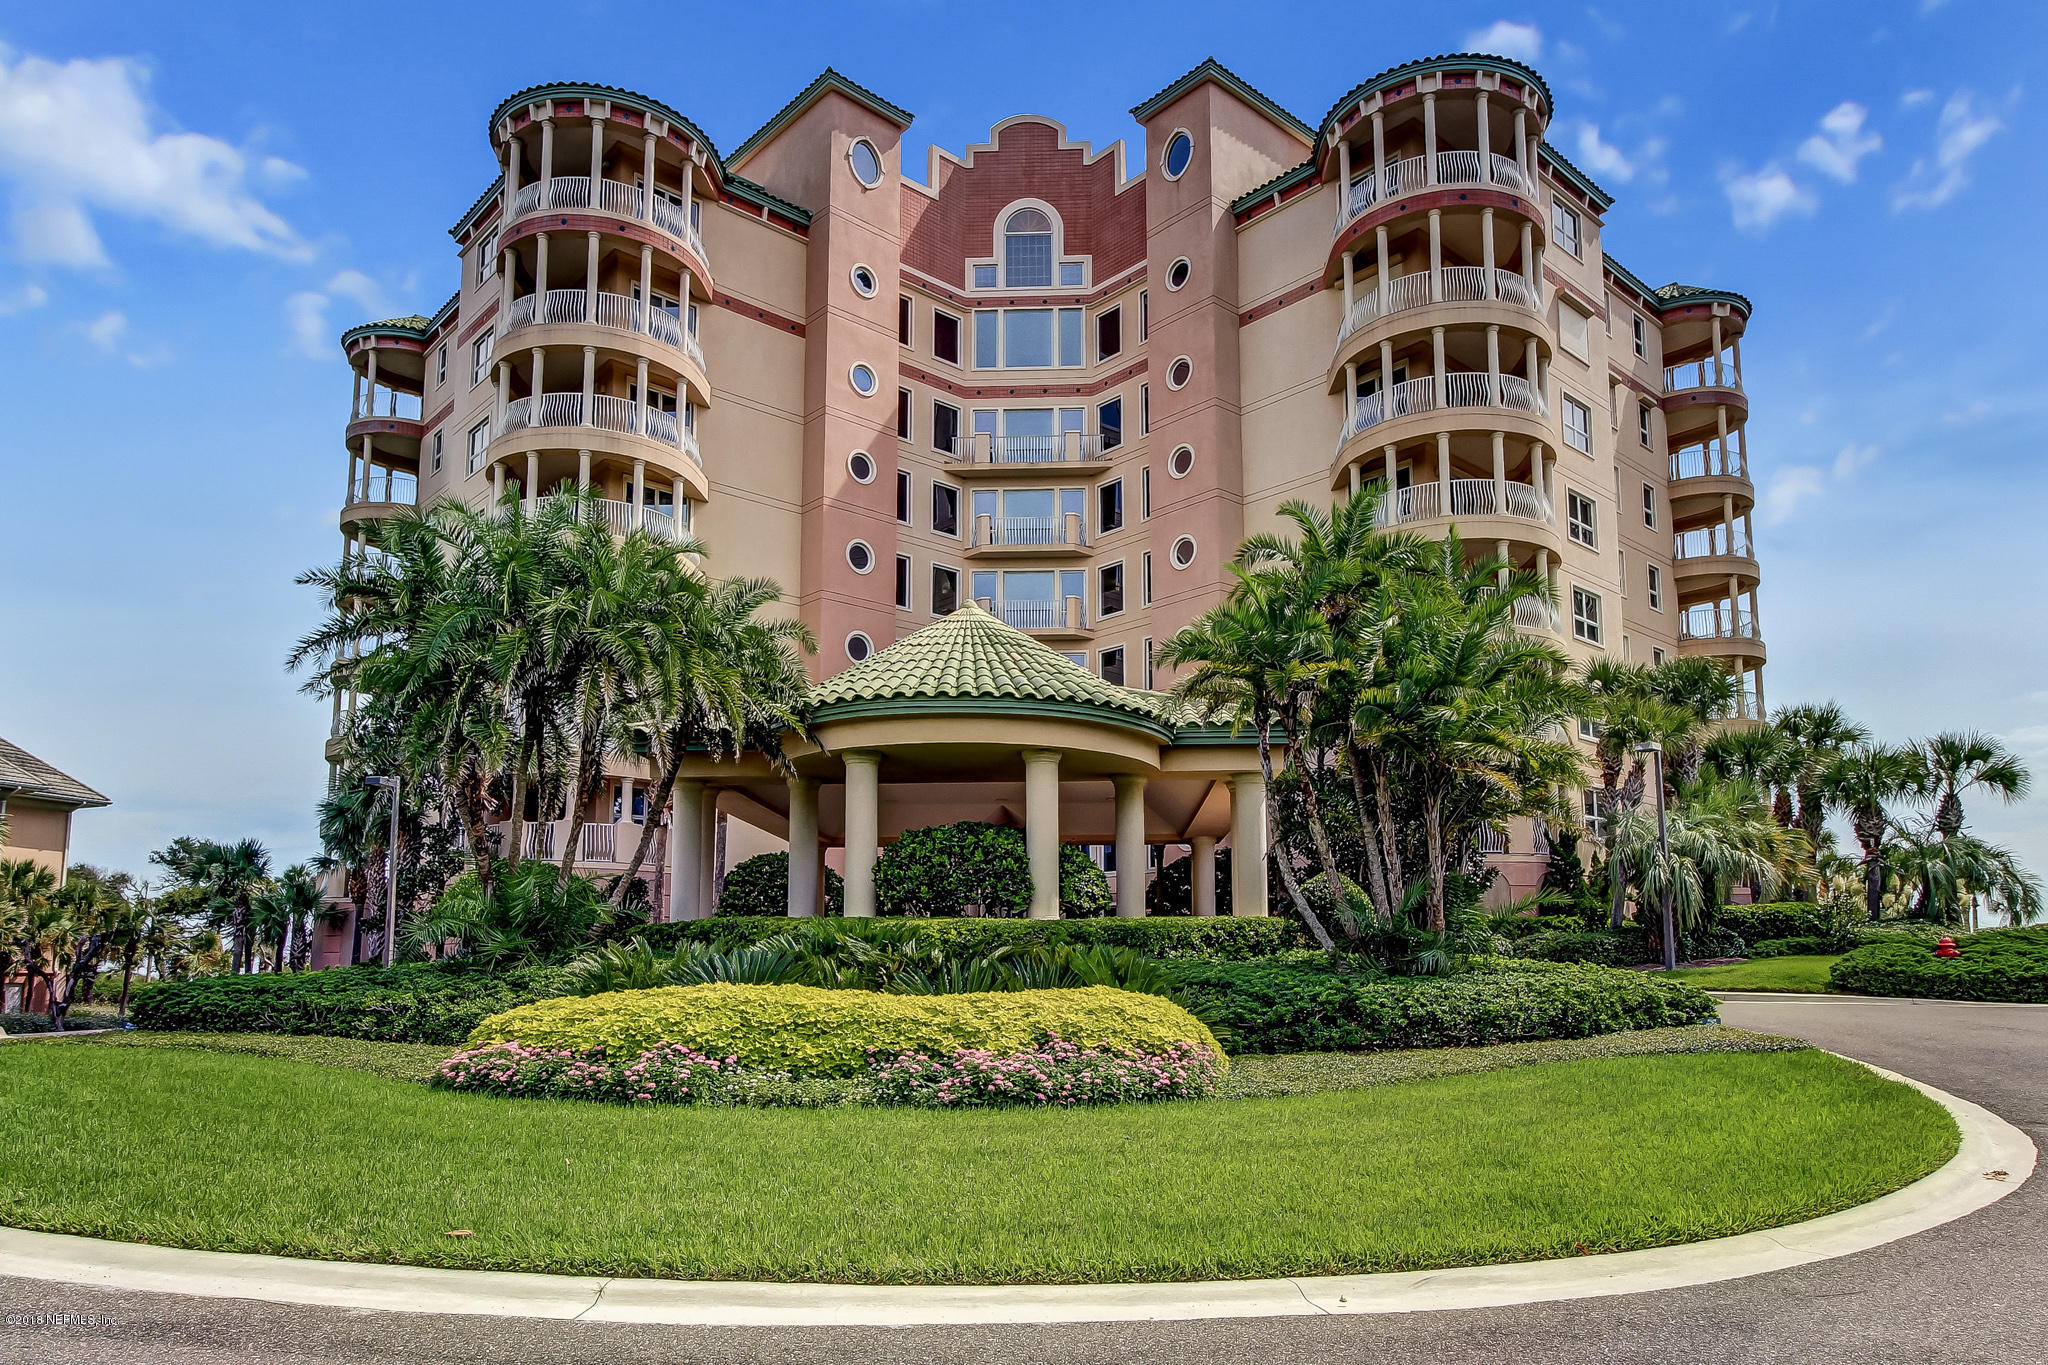 728 Ocean Club Dr Fernandina Beach, FL 32034